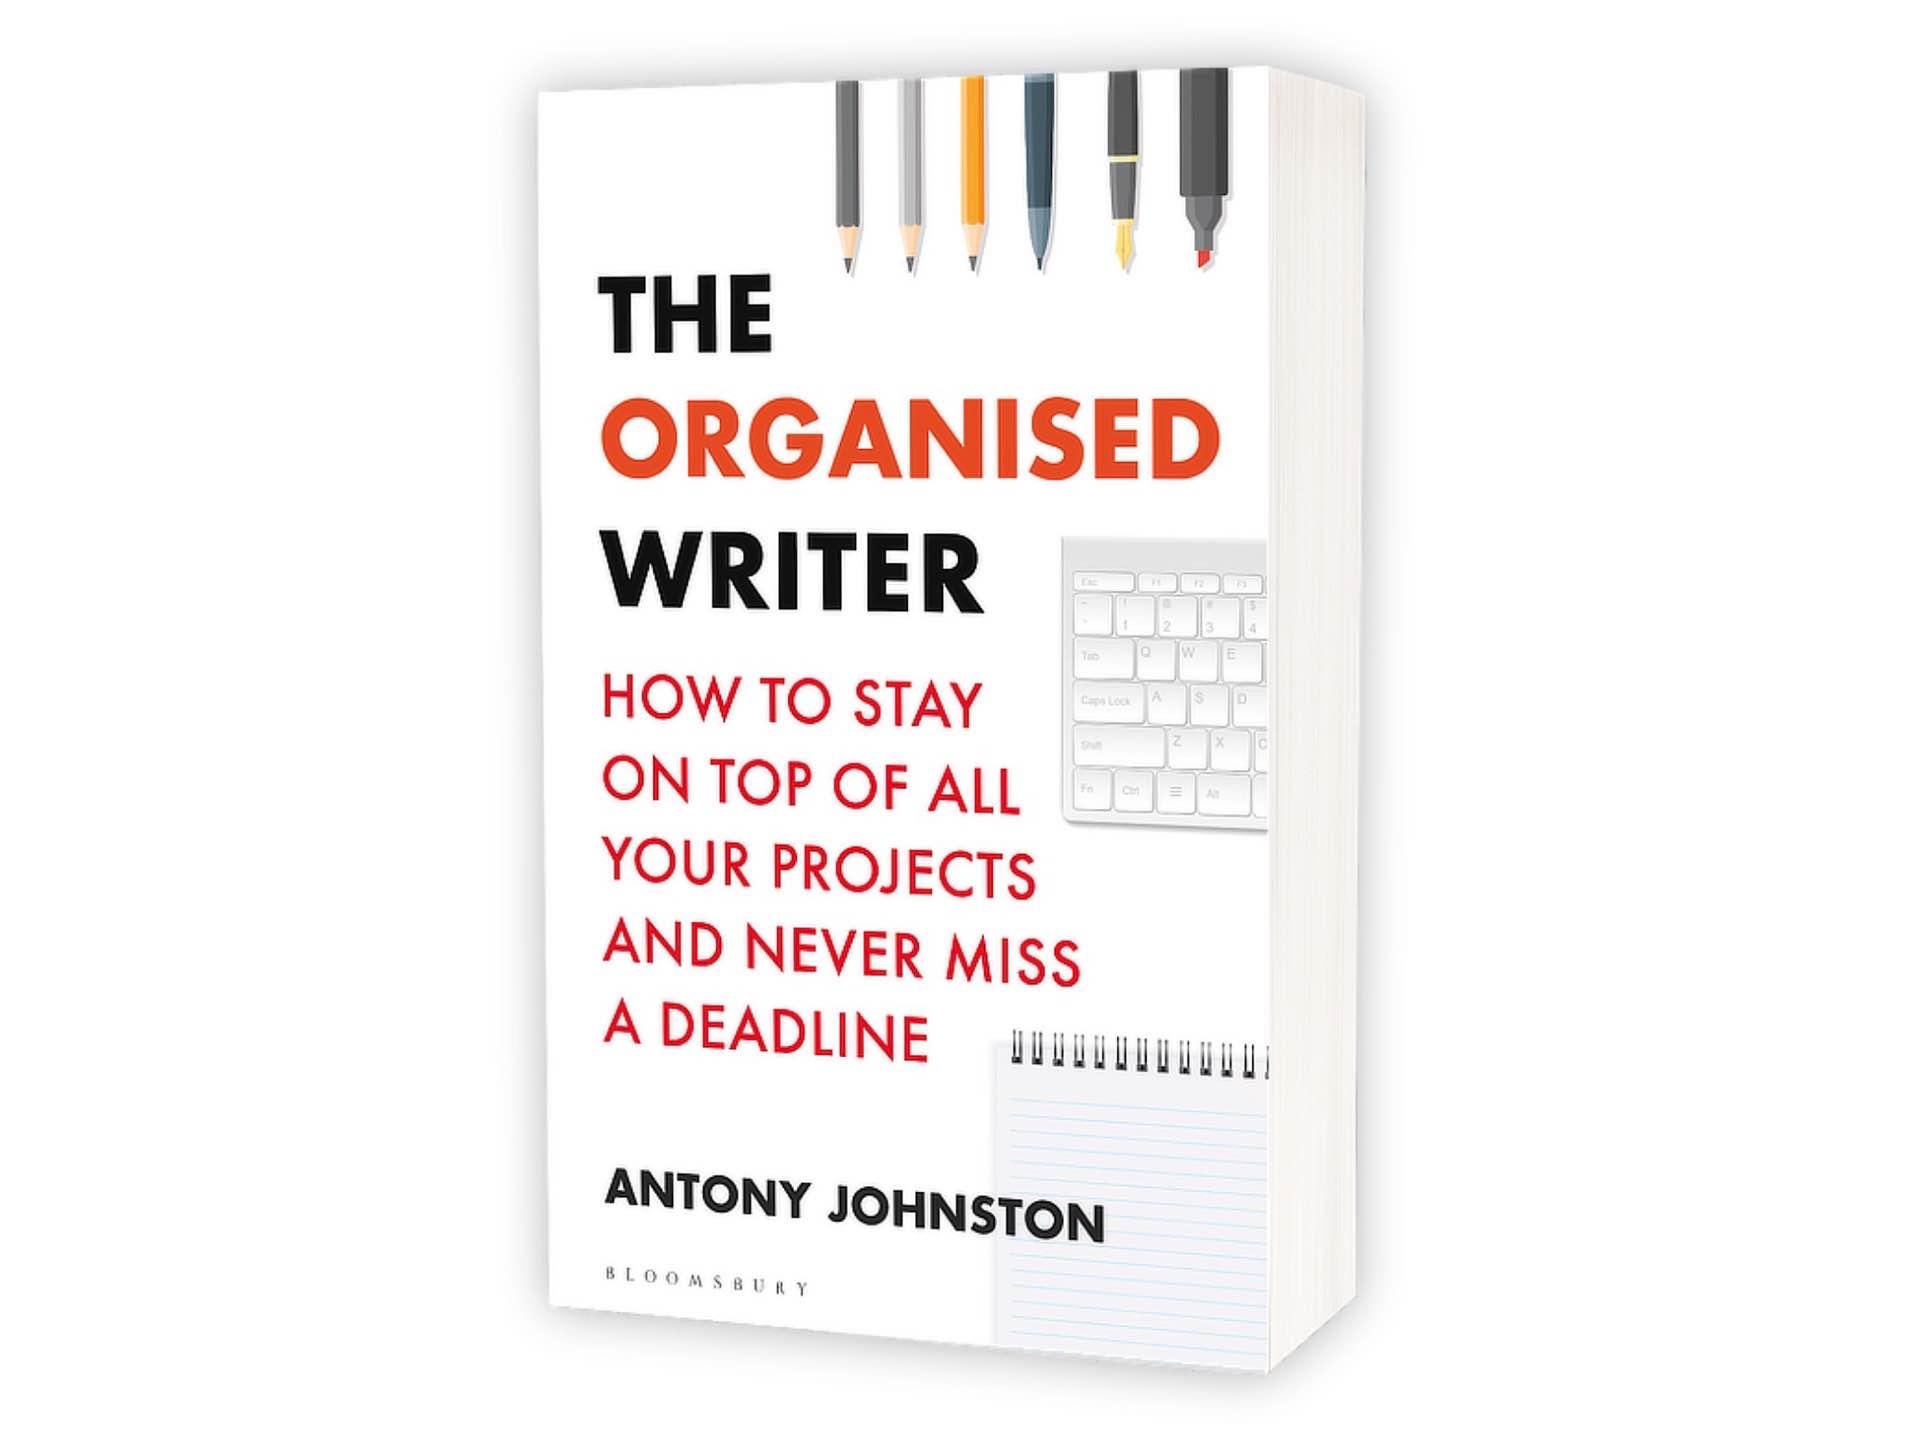 the-organised-writer-by-antony-johnston